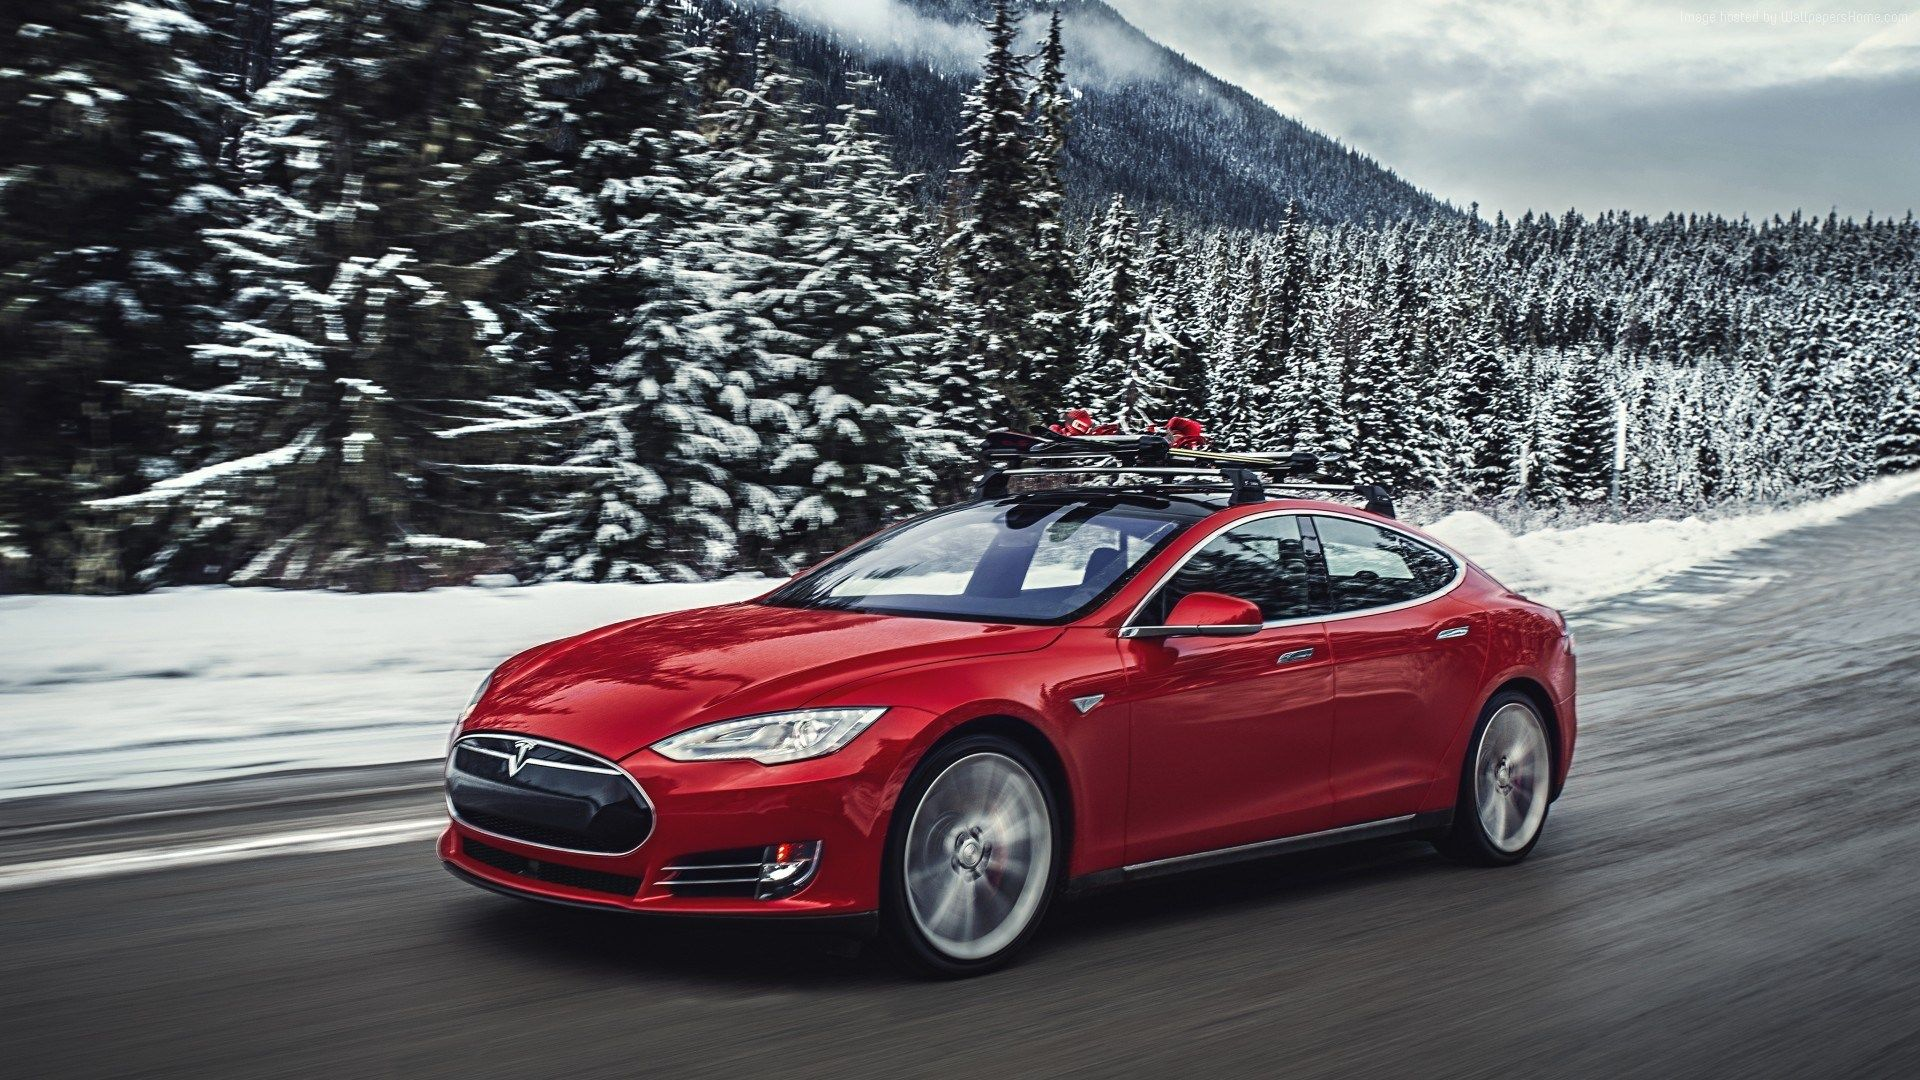 Tesla Model S P85d Wallpaper